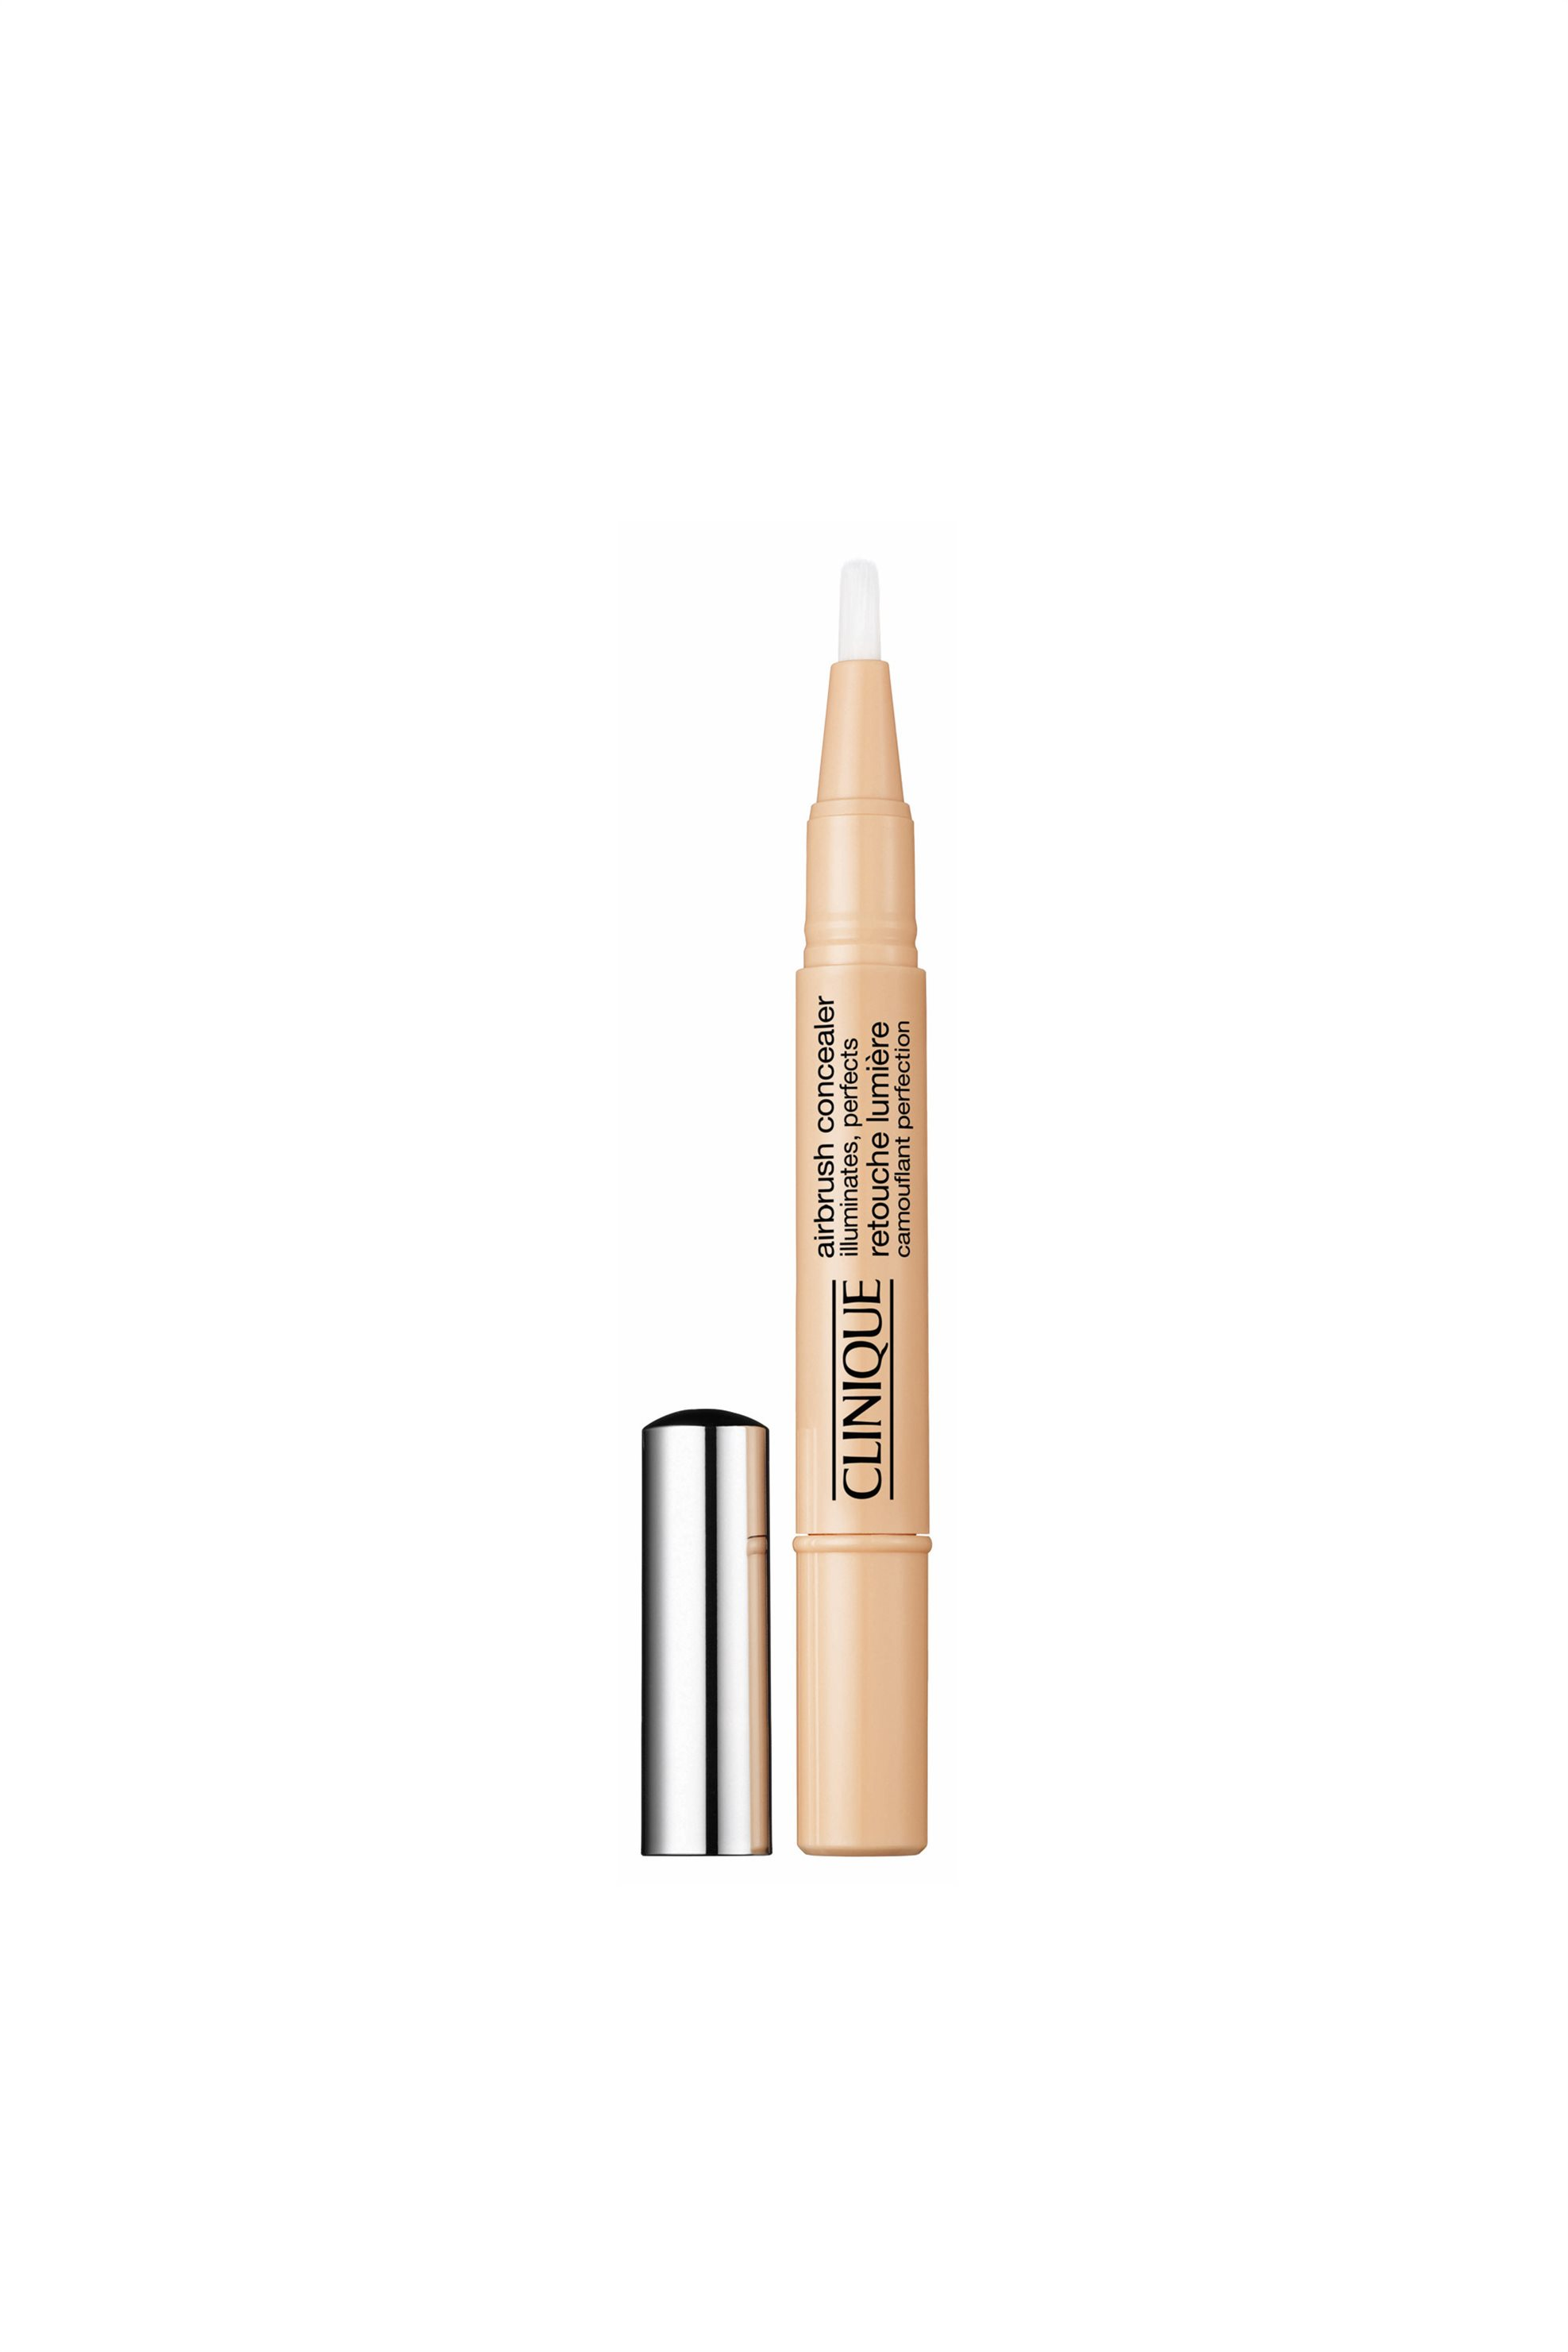 Clinique Airbrush Concealer™ 20 Illuminator 1.5 ml - 6CM2200000 ομορφια   καλλυντικα επιλεκτικησ   μακιγιάζ   πρόσωπο   concealers